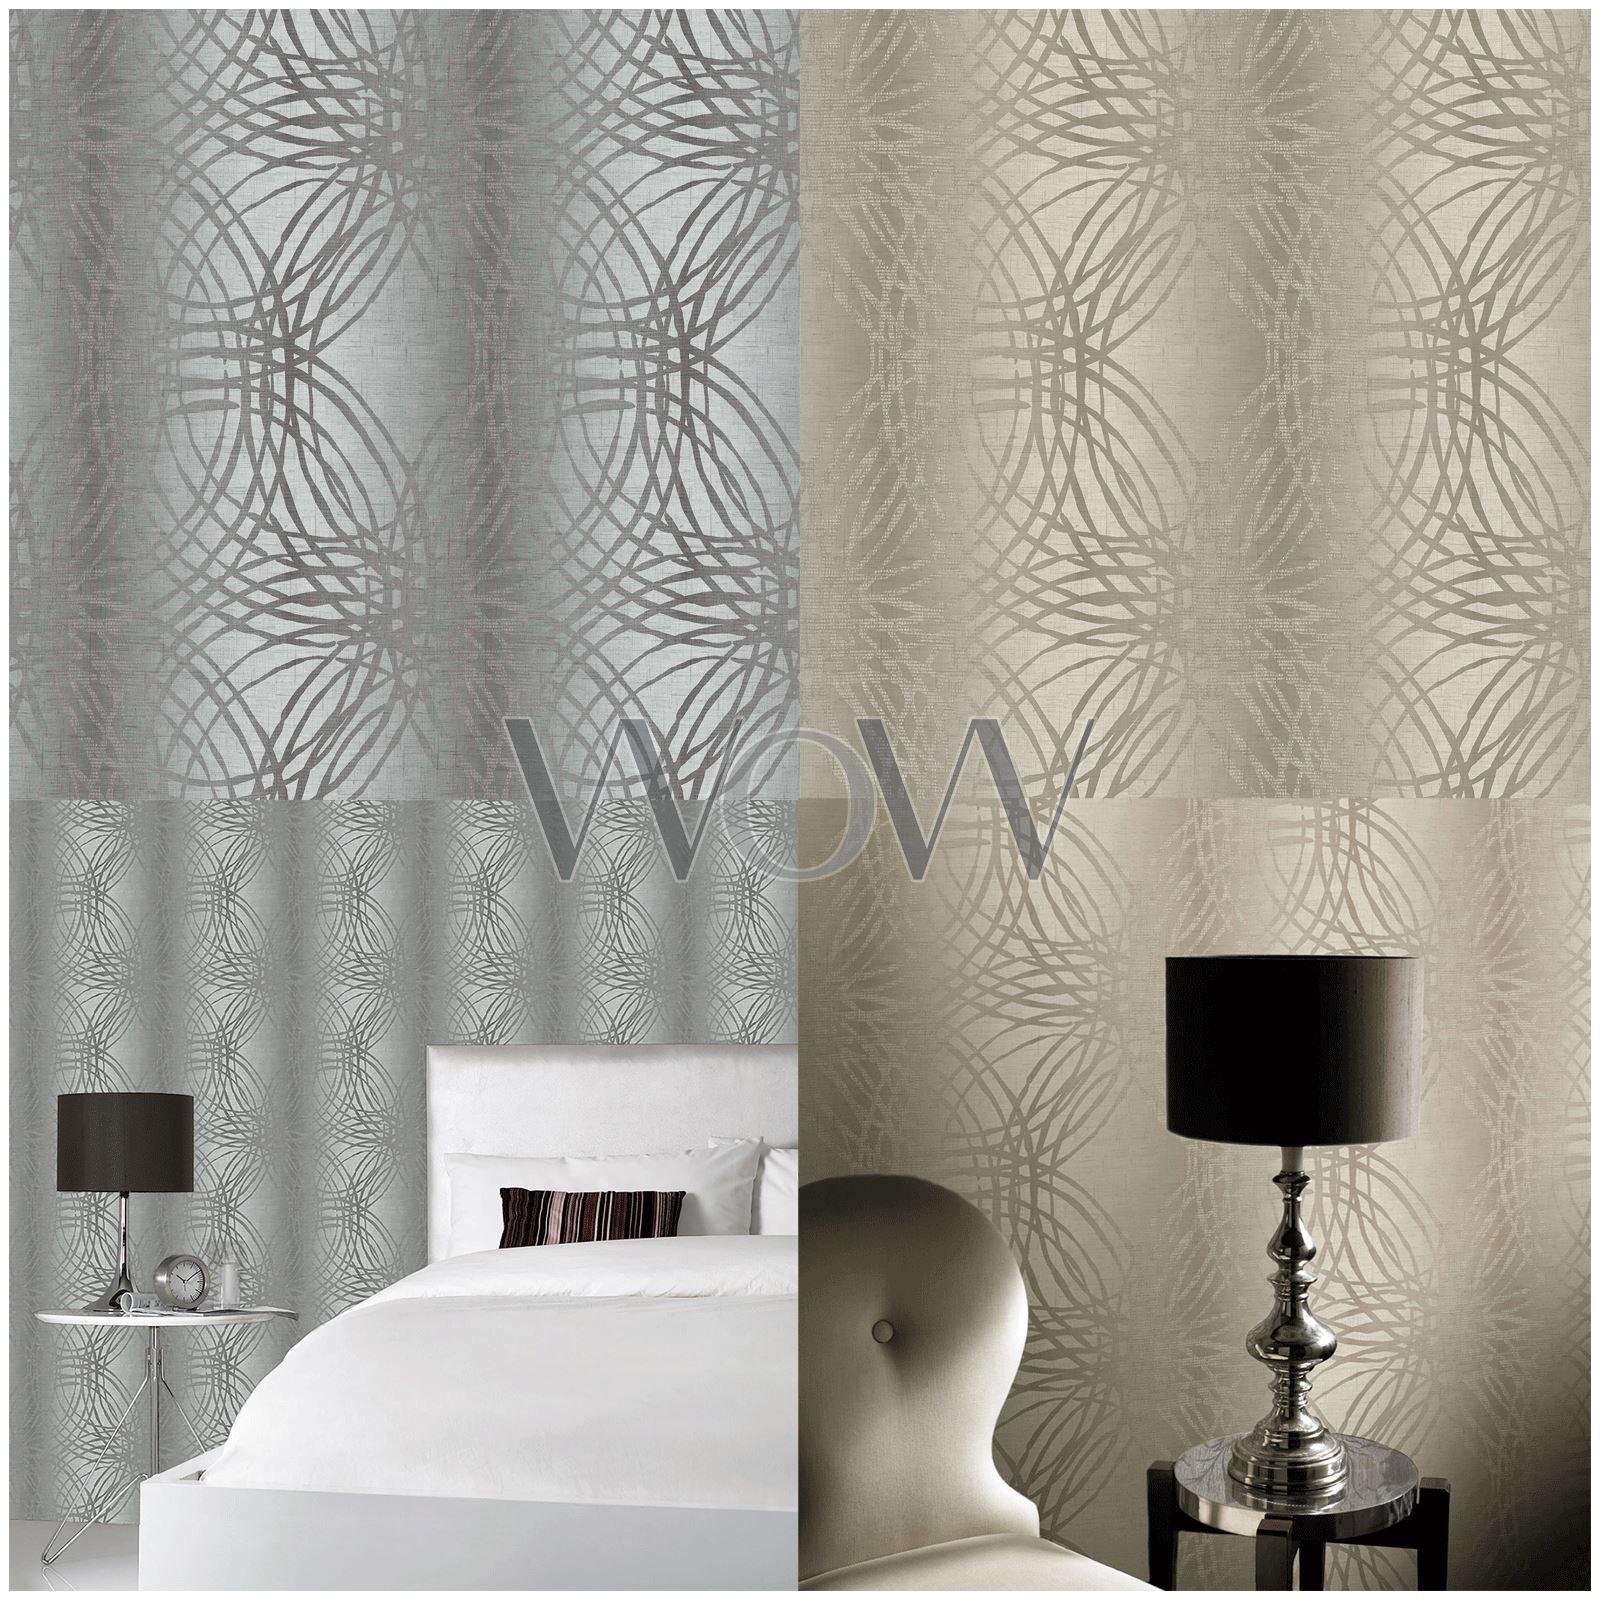 Grandeco Leon Textured Geometric Glitter Wallpaper Silver Taupe